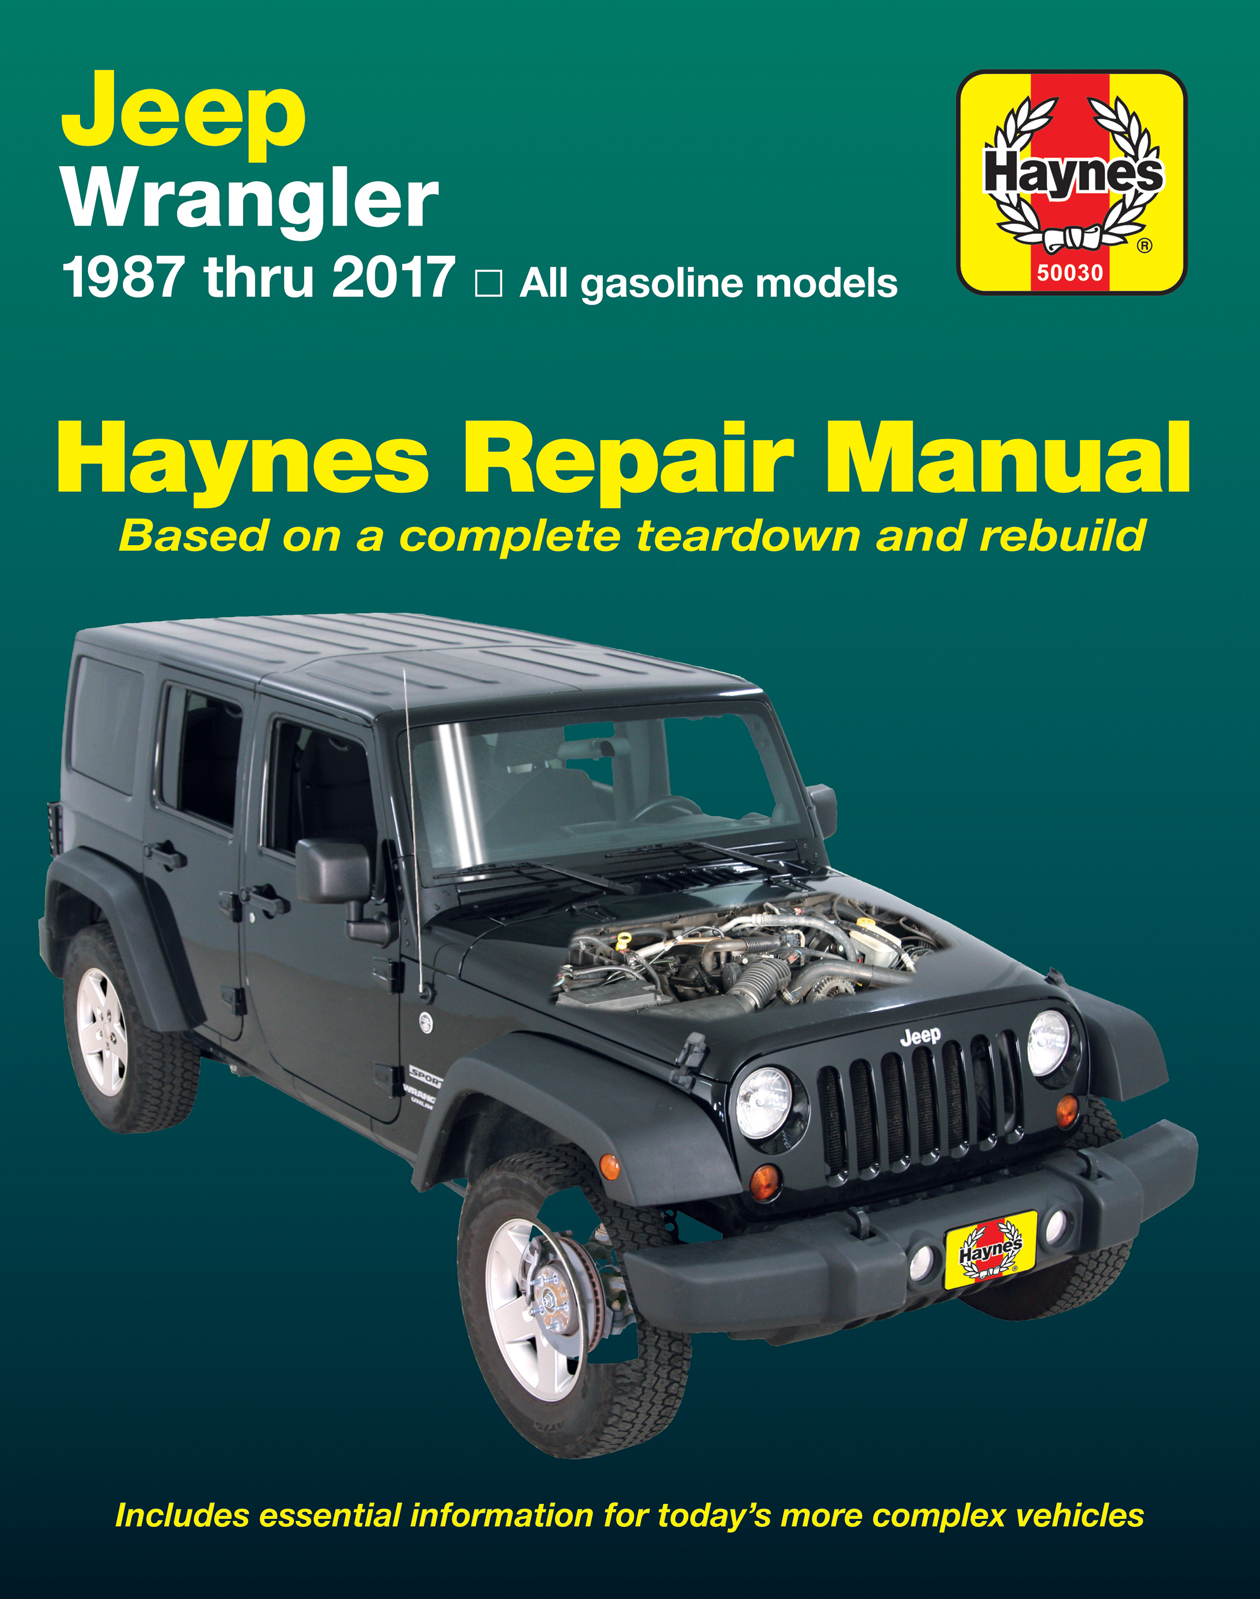 Jeep Wrangler 4-cyl & 6-cyl Gas Engine, 2WD & 4WD (87-17) Haynes Repair Manual